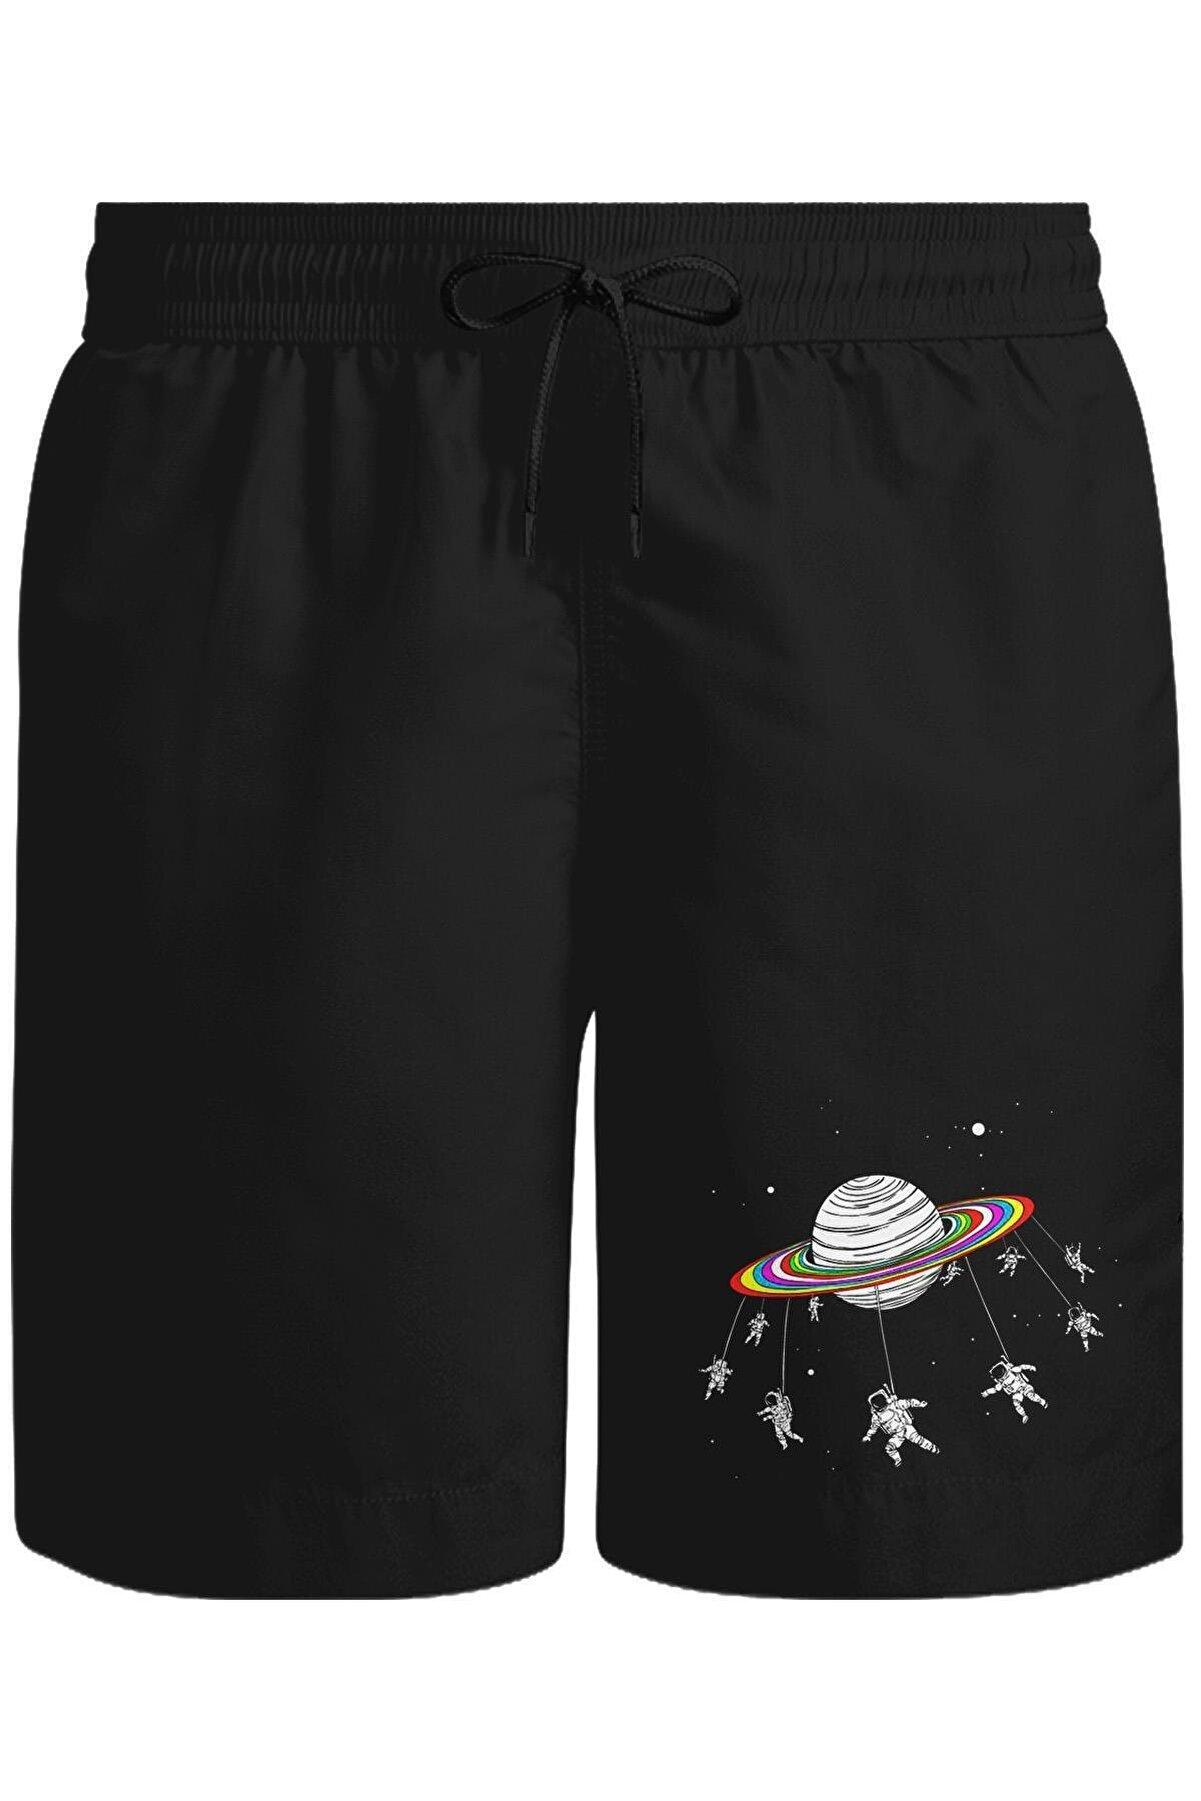 Lord T-Shirt Swing Astronot Unisex Siyah Şort